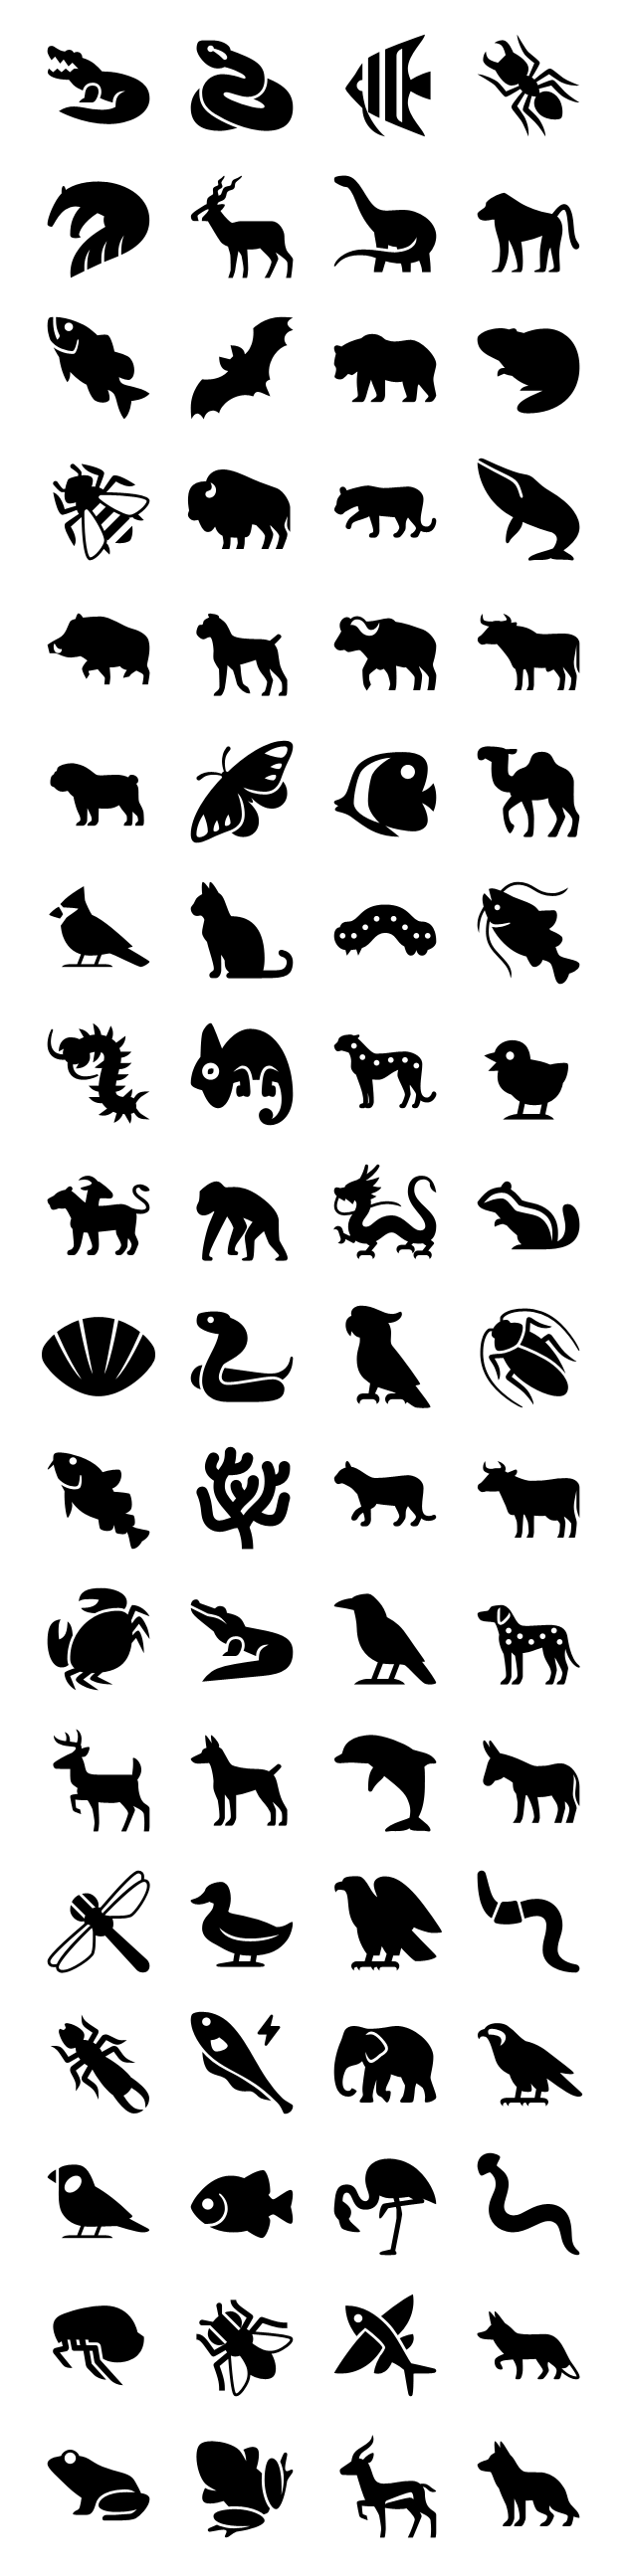 iphone_animals_114_1